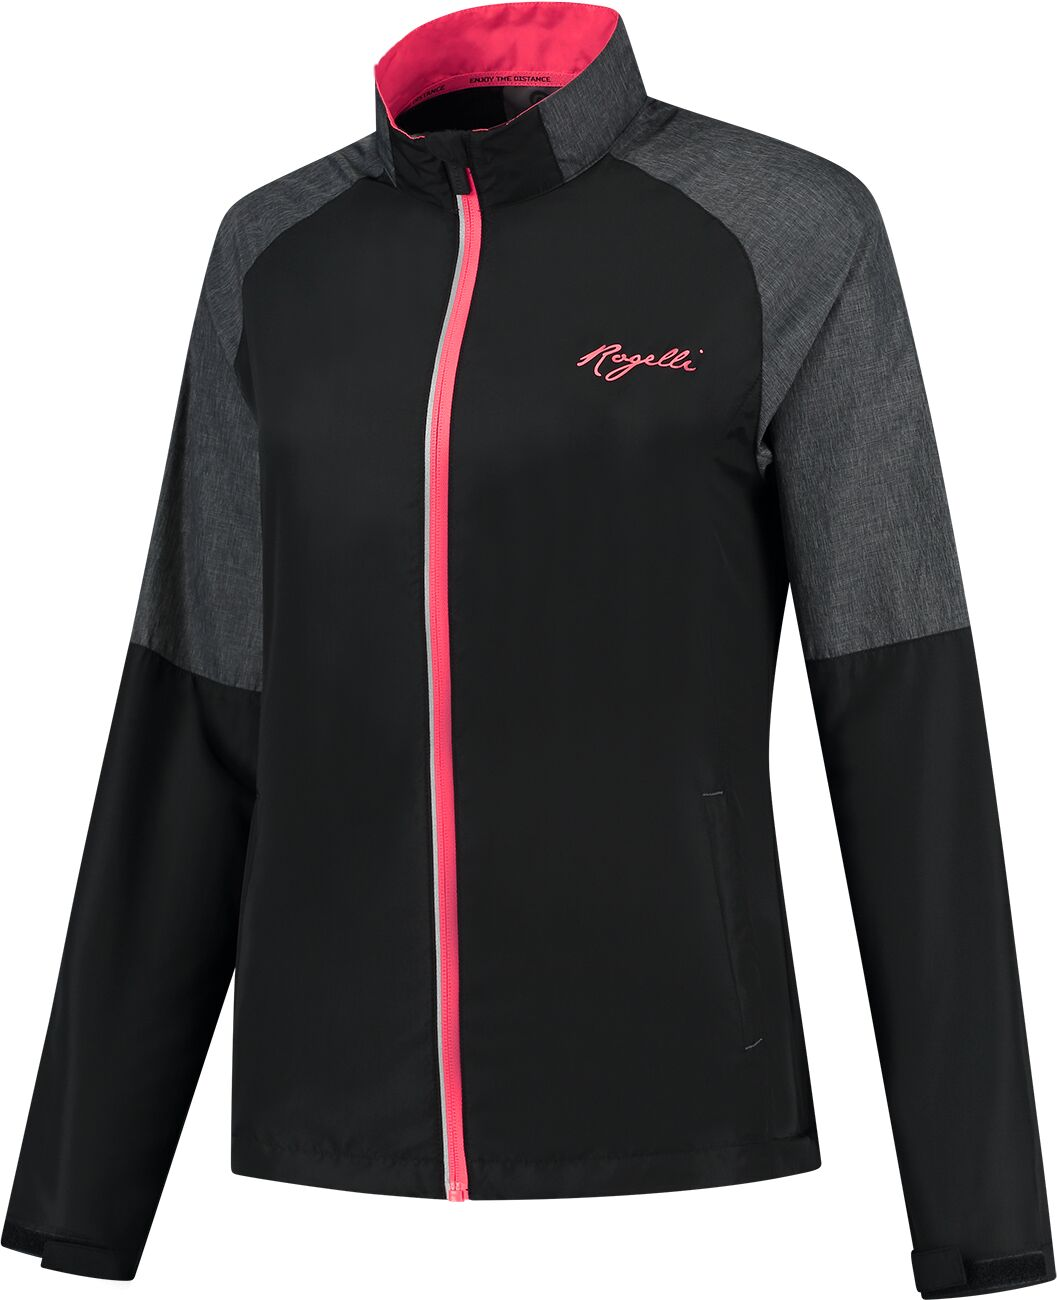 ROGELLI damska kurtka do biegania ENJOY black ROG351112 Rozmiar: XL,ROG351112.XS